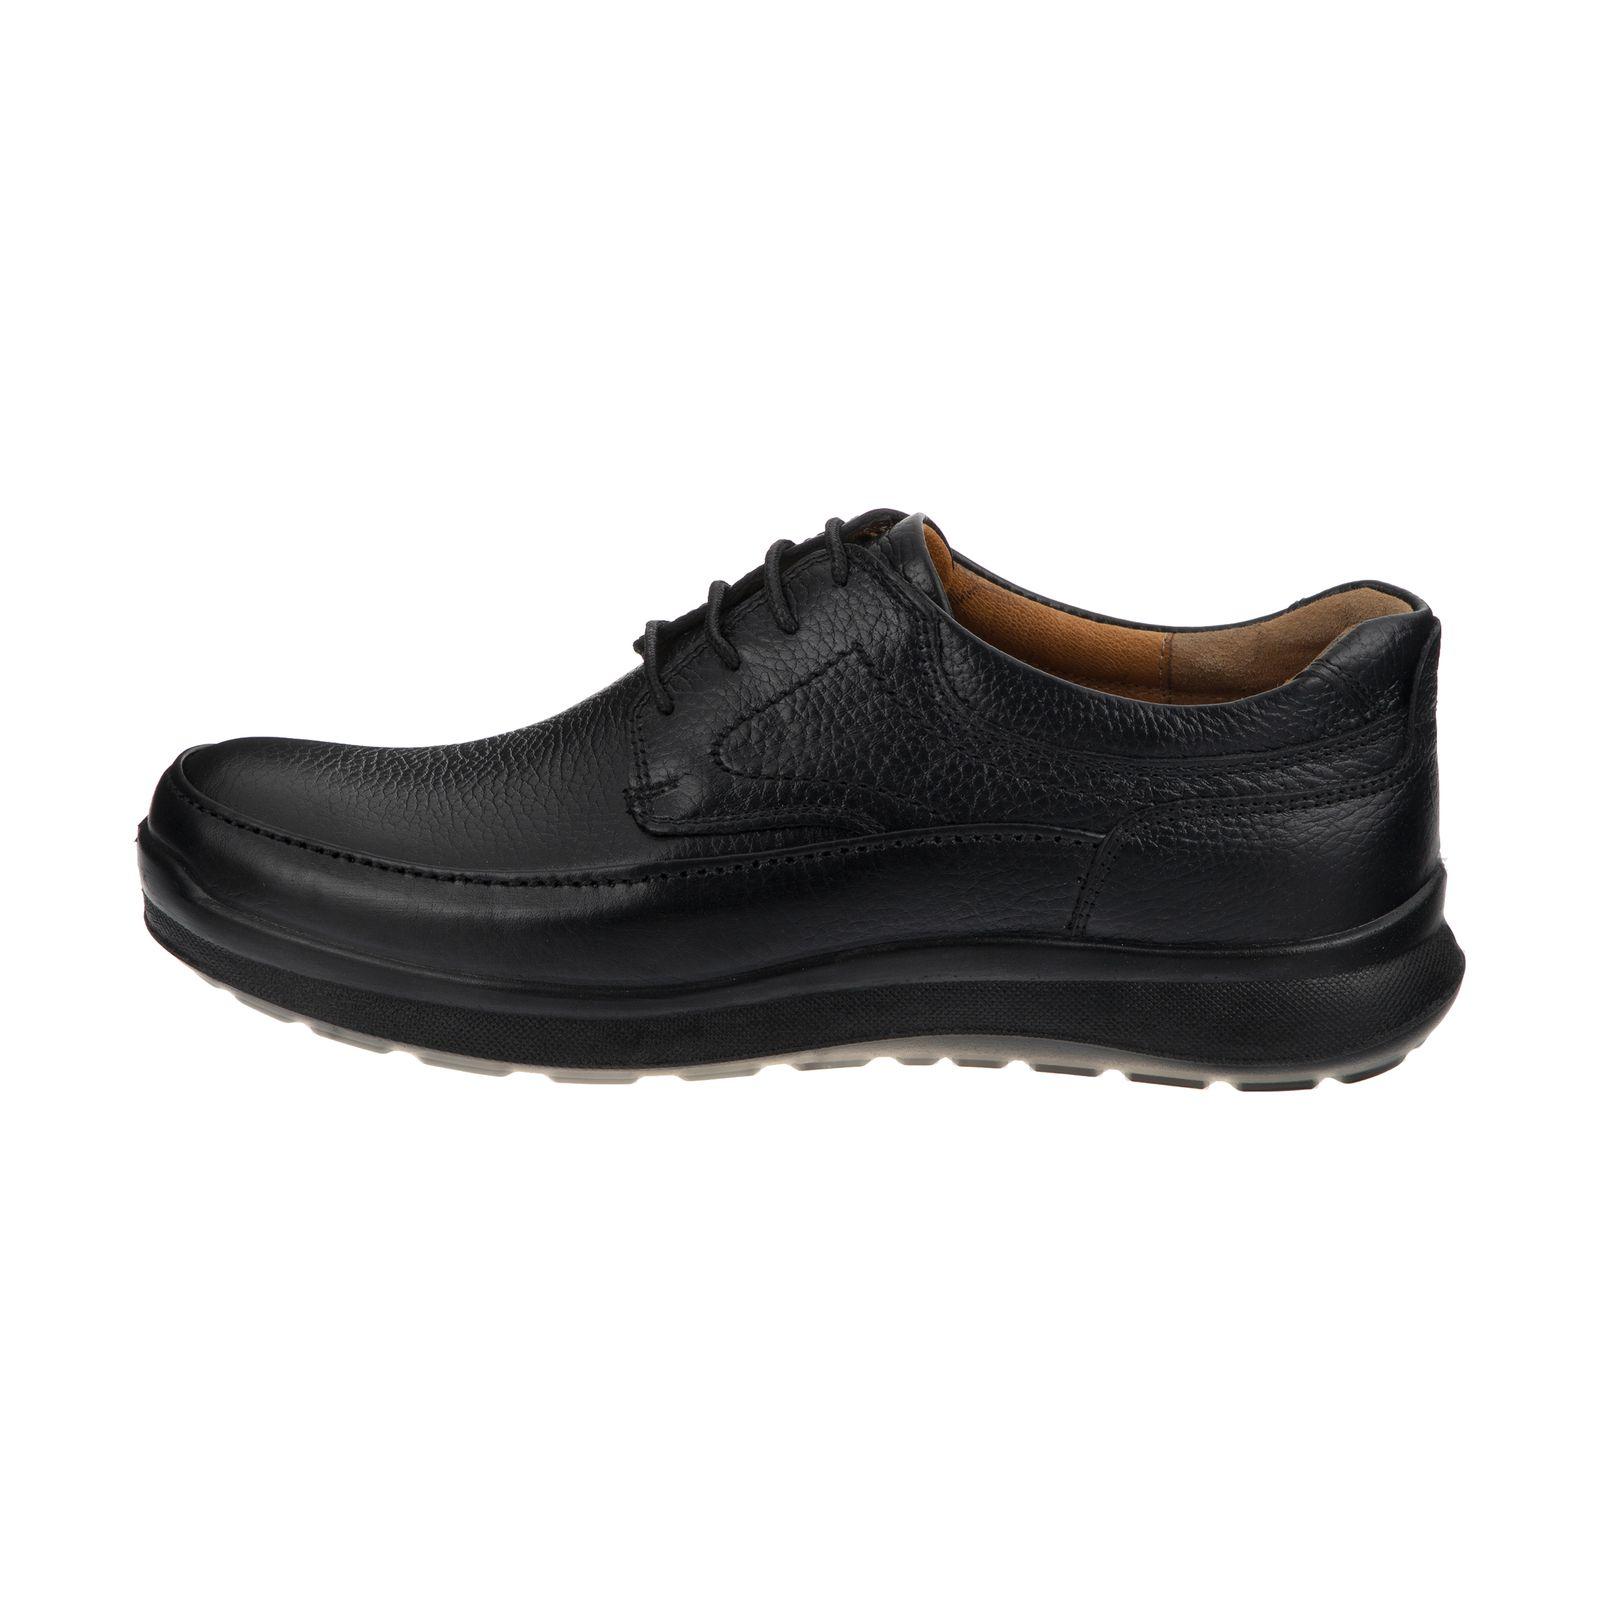 کفش روزمره مردانه بلوط مدل 7266C503101 -  - 2